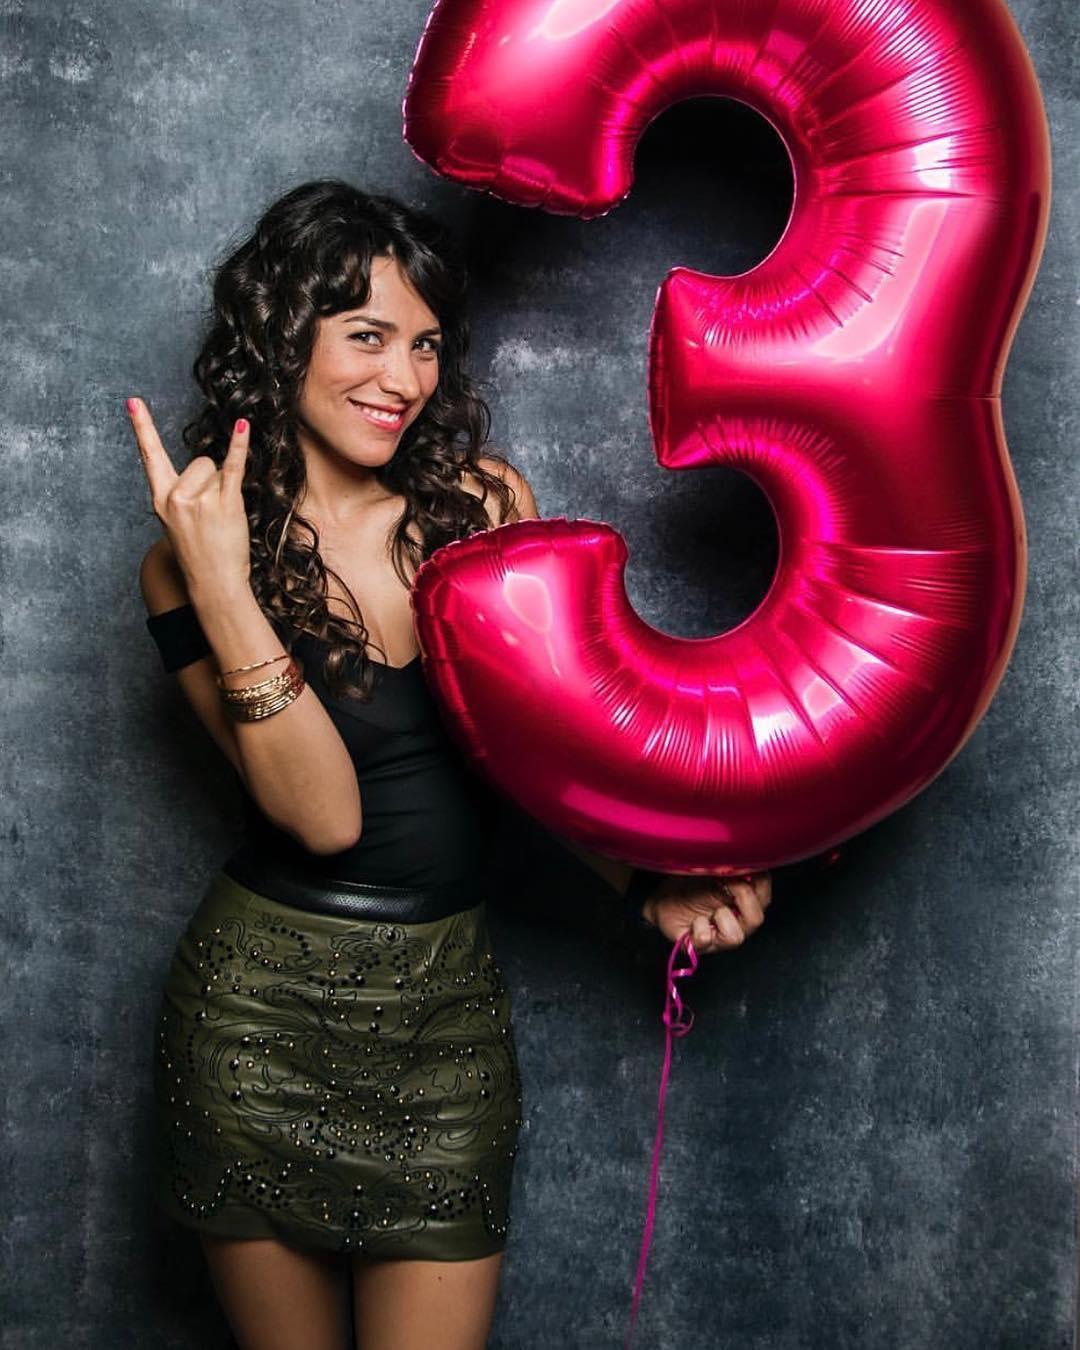 Claudia Schmidt sobre Daniela Vega: No es una mujer como yo